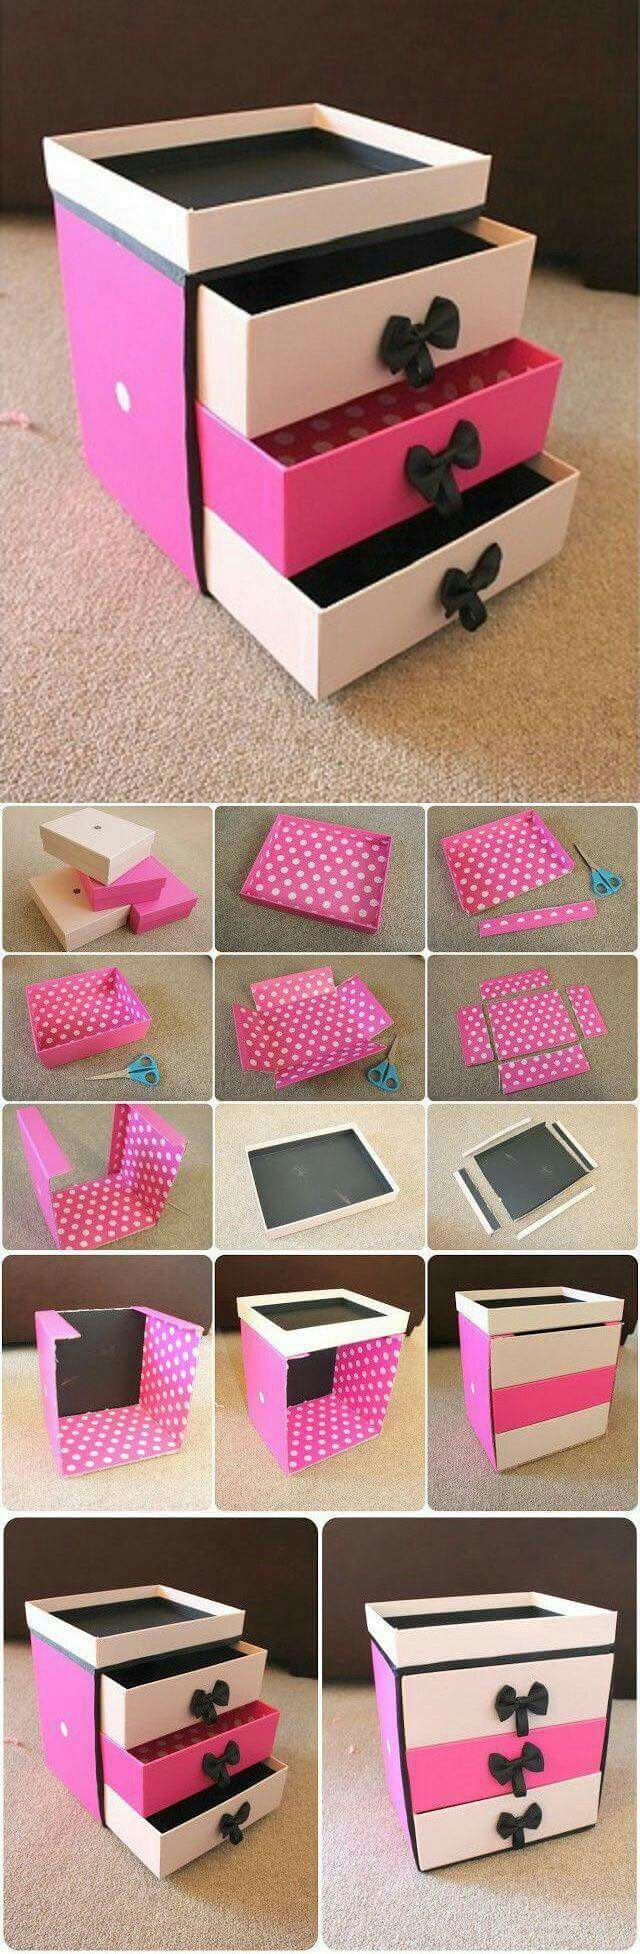 DIY ideas : Google +